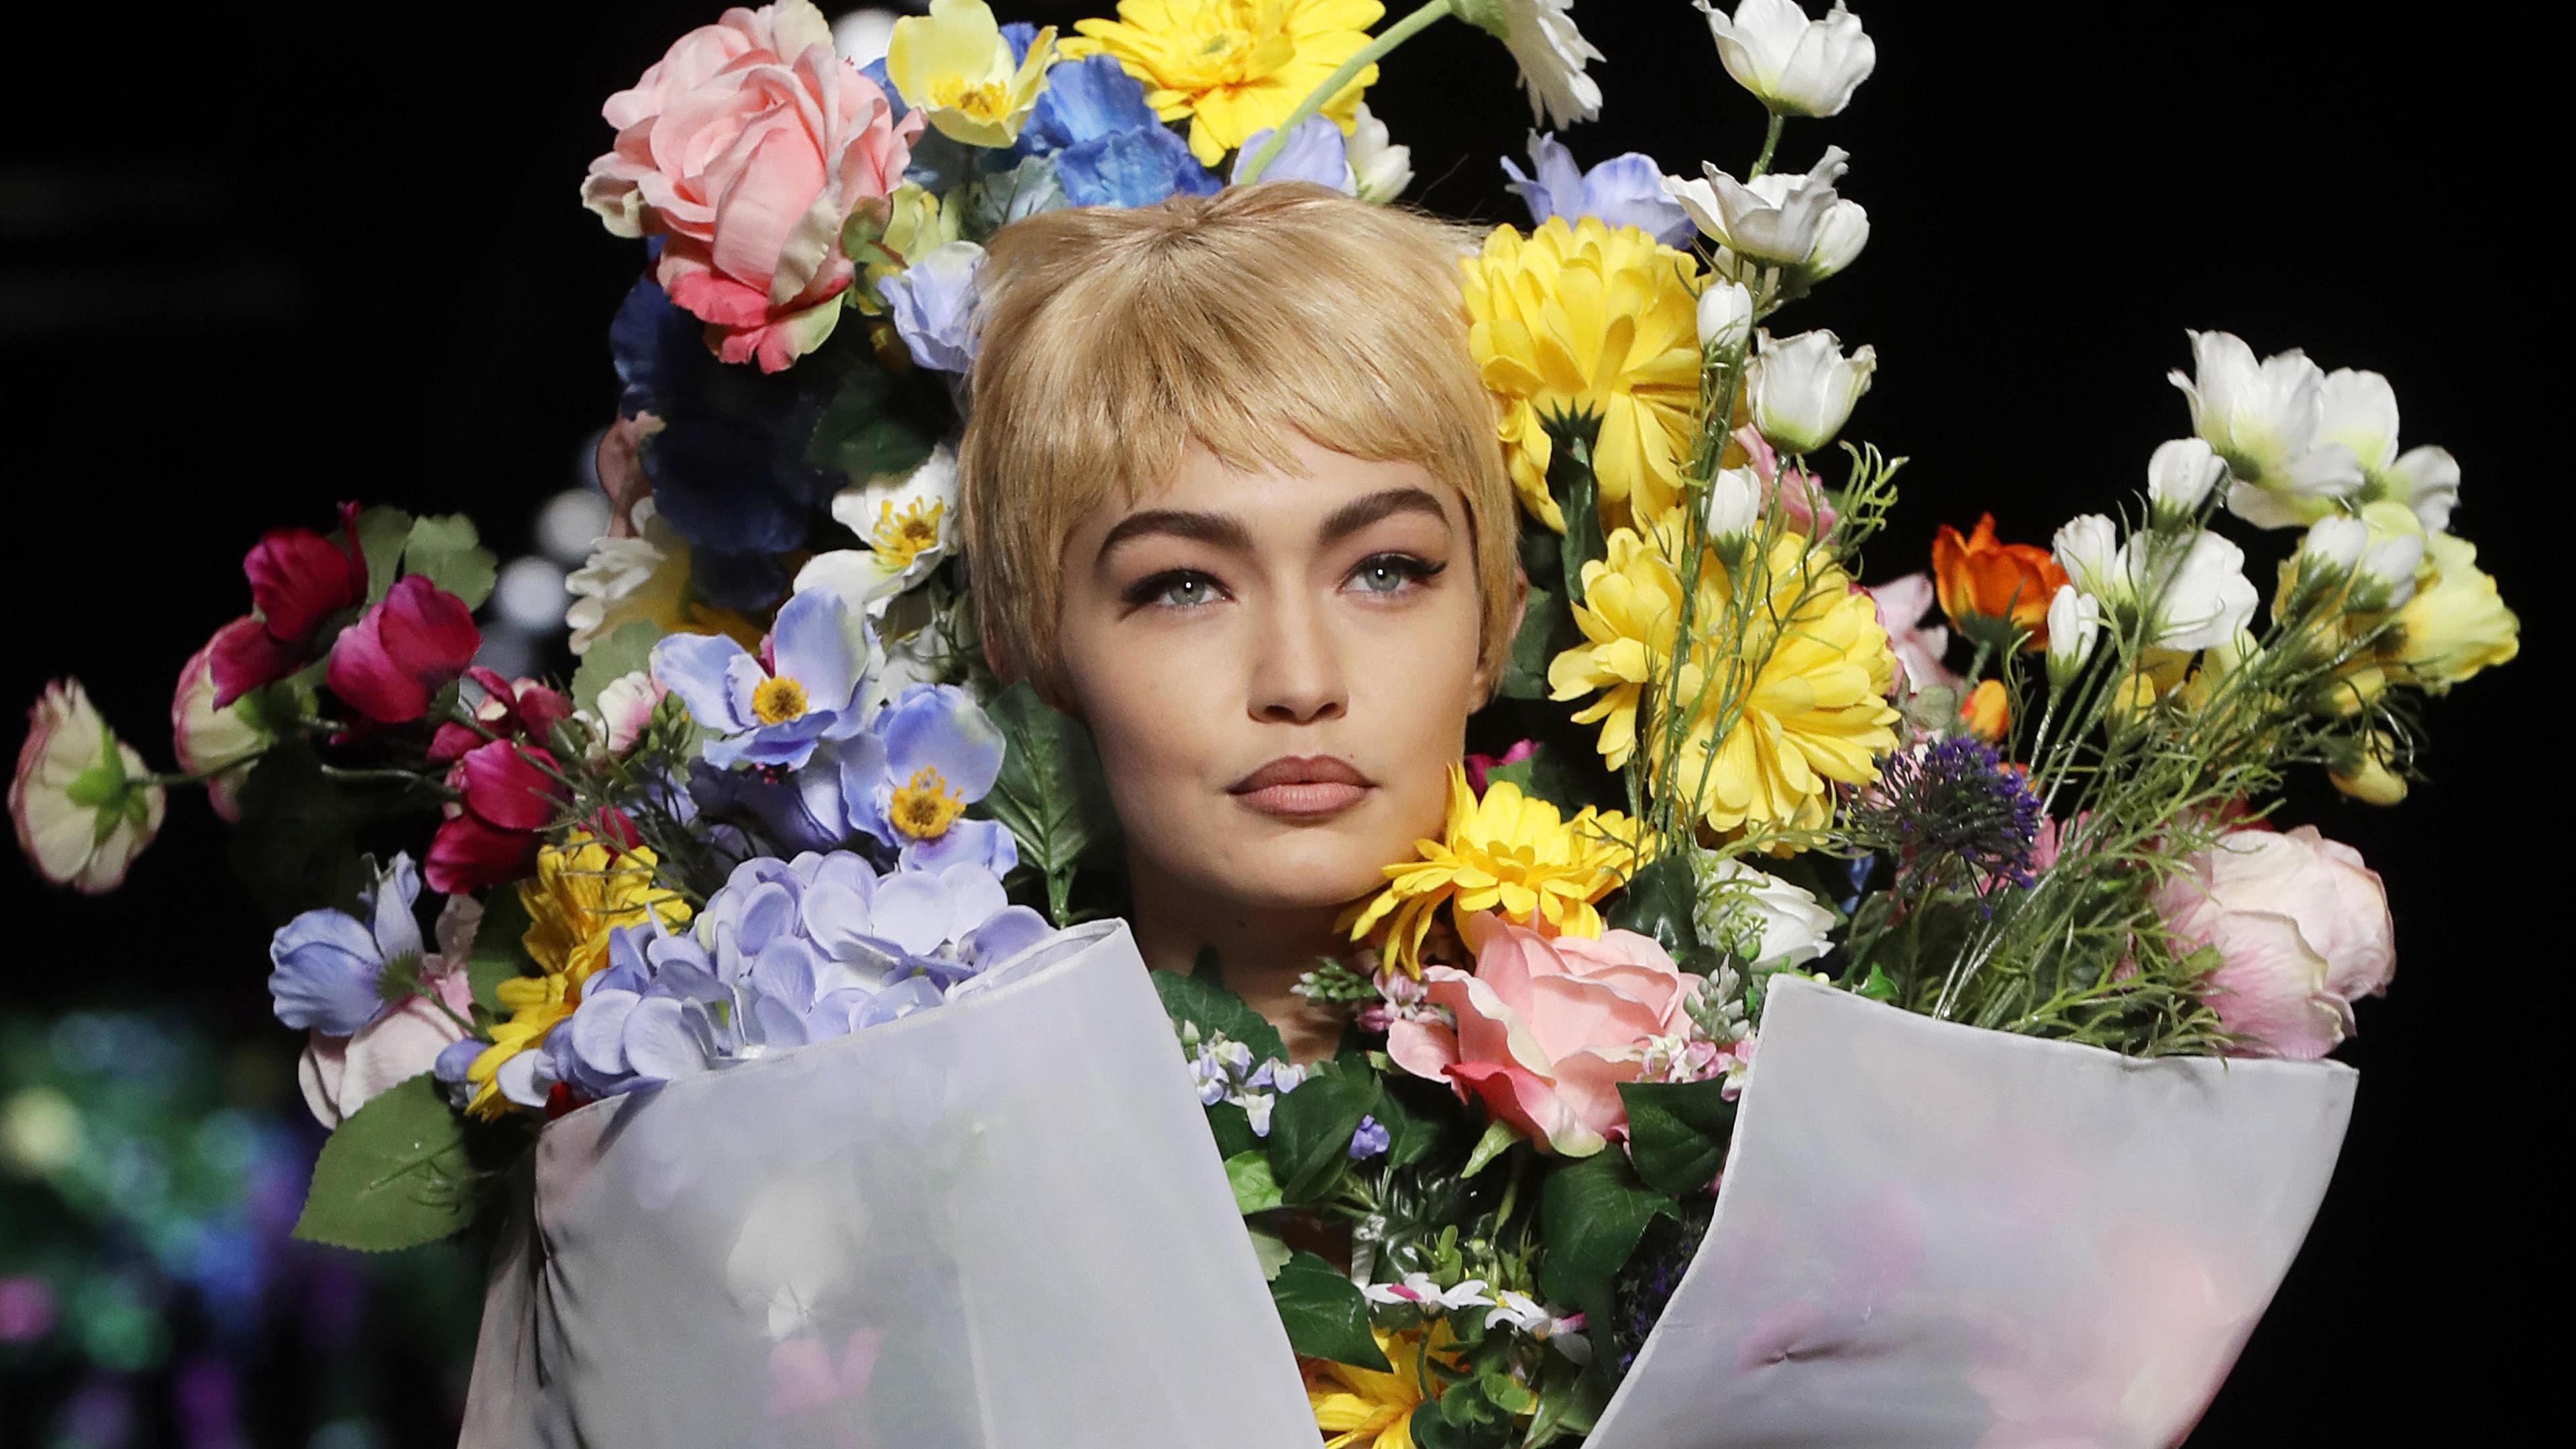 gigi hadid 5k 2018 1536861659 - Gigi Hadid 5k 2018 - model wallpapers, hd-wallpapers, girls wallpapers, gigi hadid wallpapers, celebrities wallpapers, 5k wallpapers, 4k-wallpapers